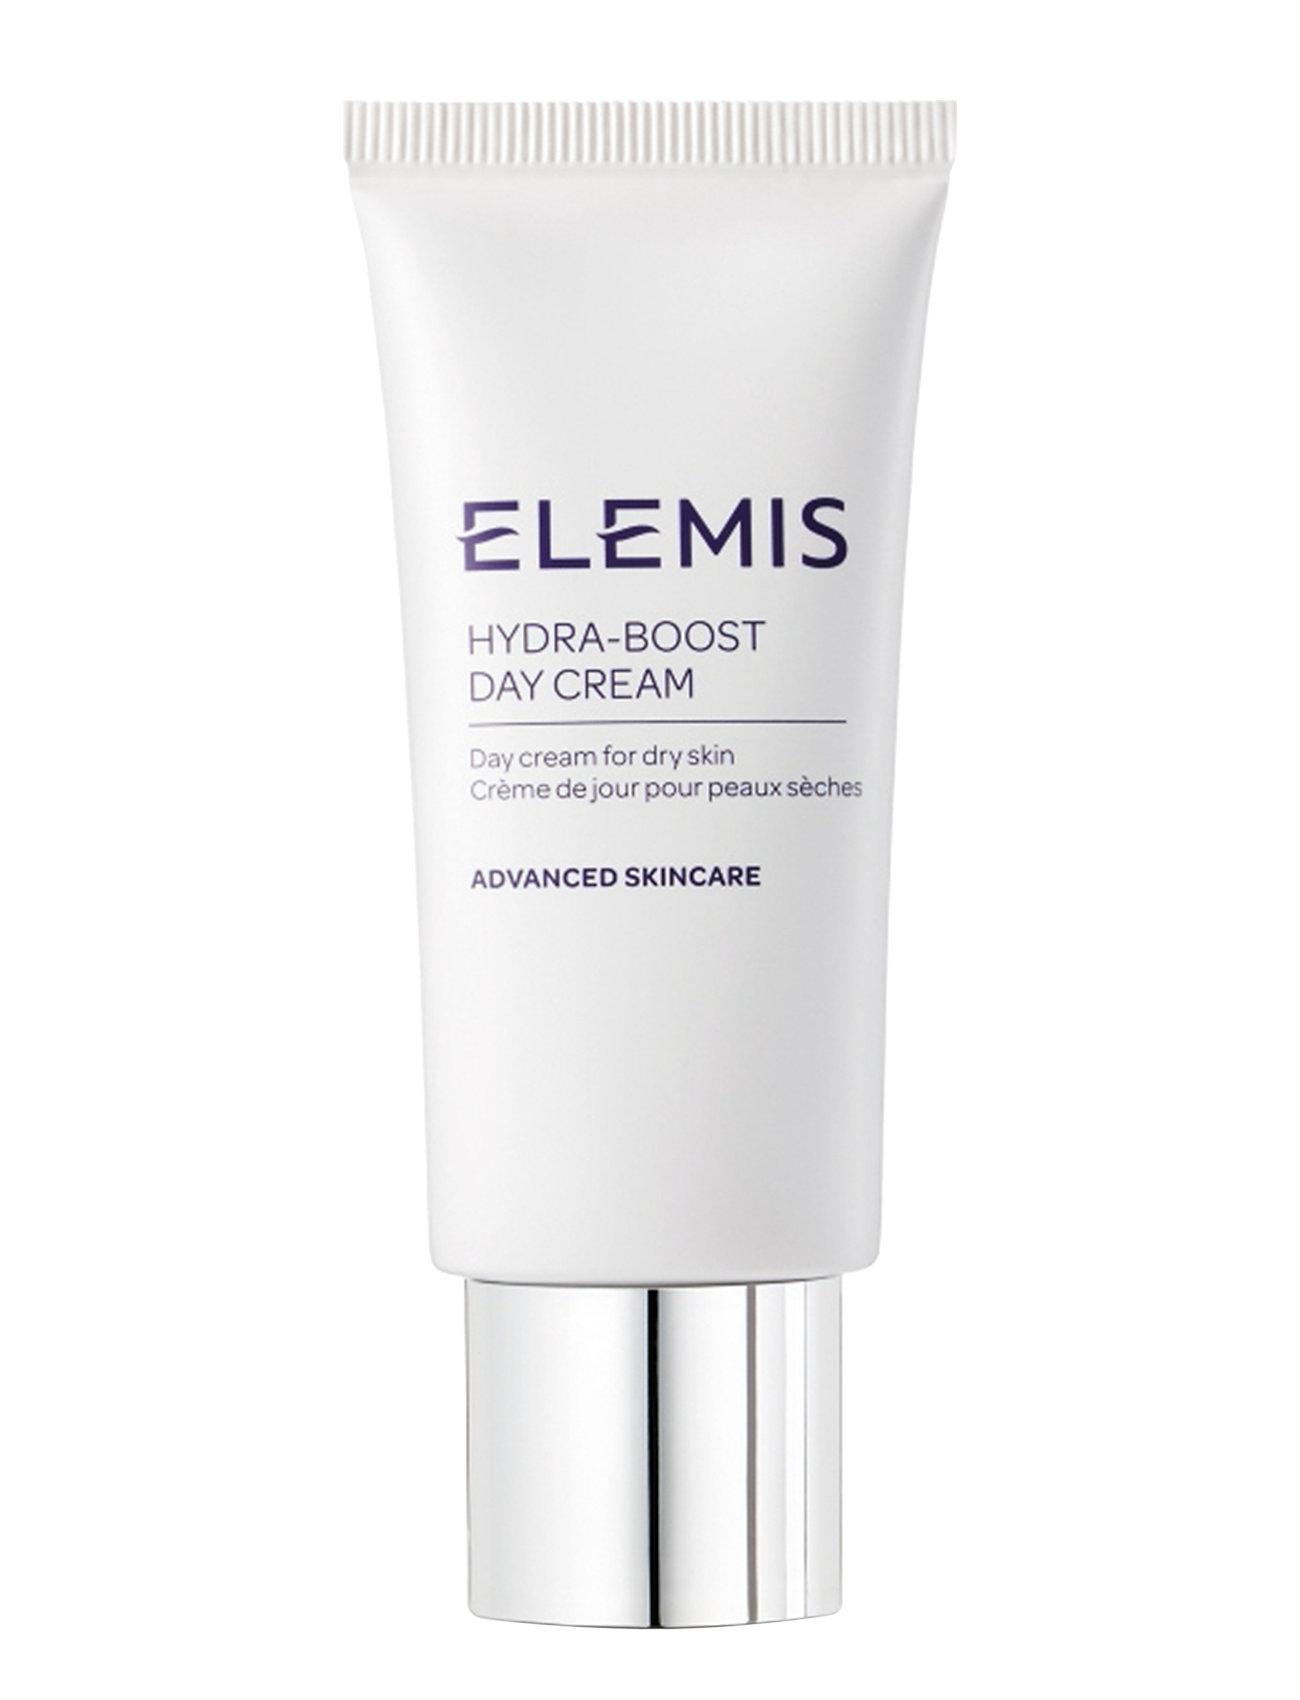 Elemis Hydra-Boost Day Cream Normal - Dry - CLEAR